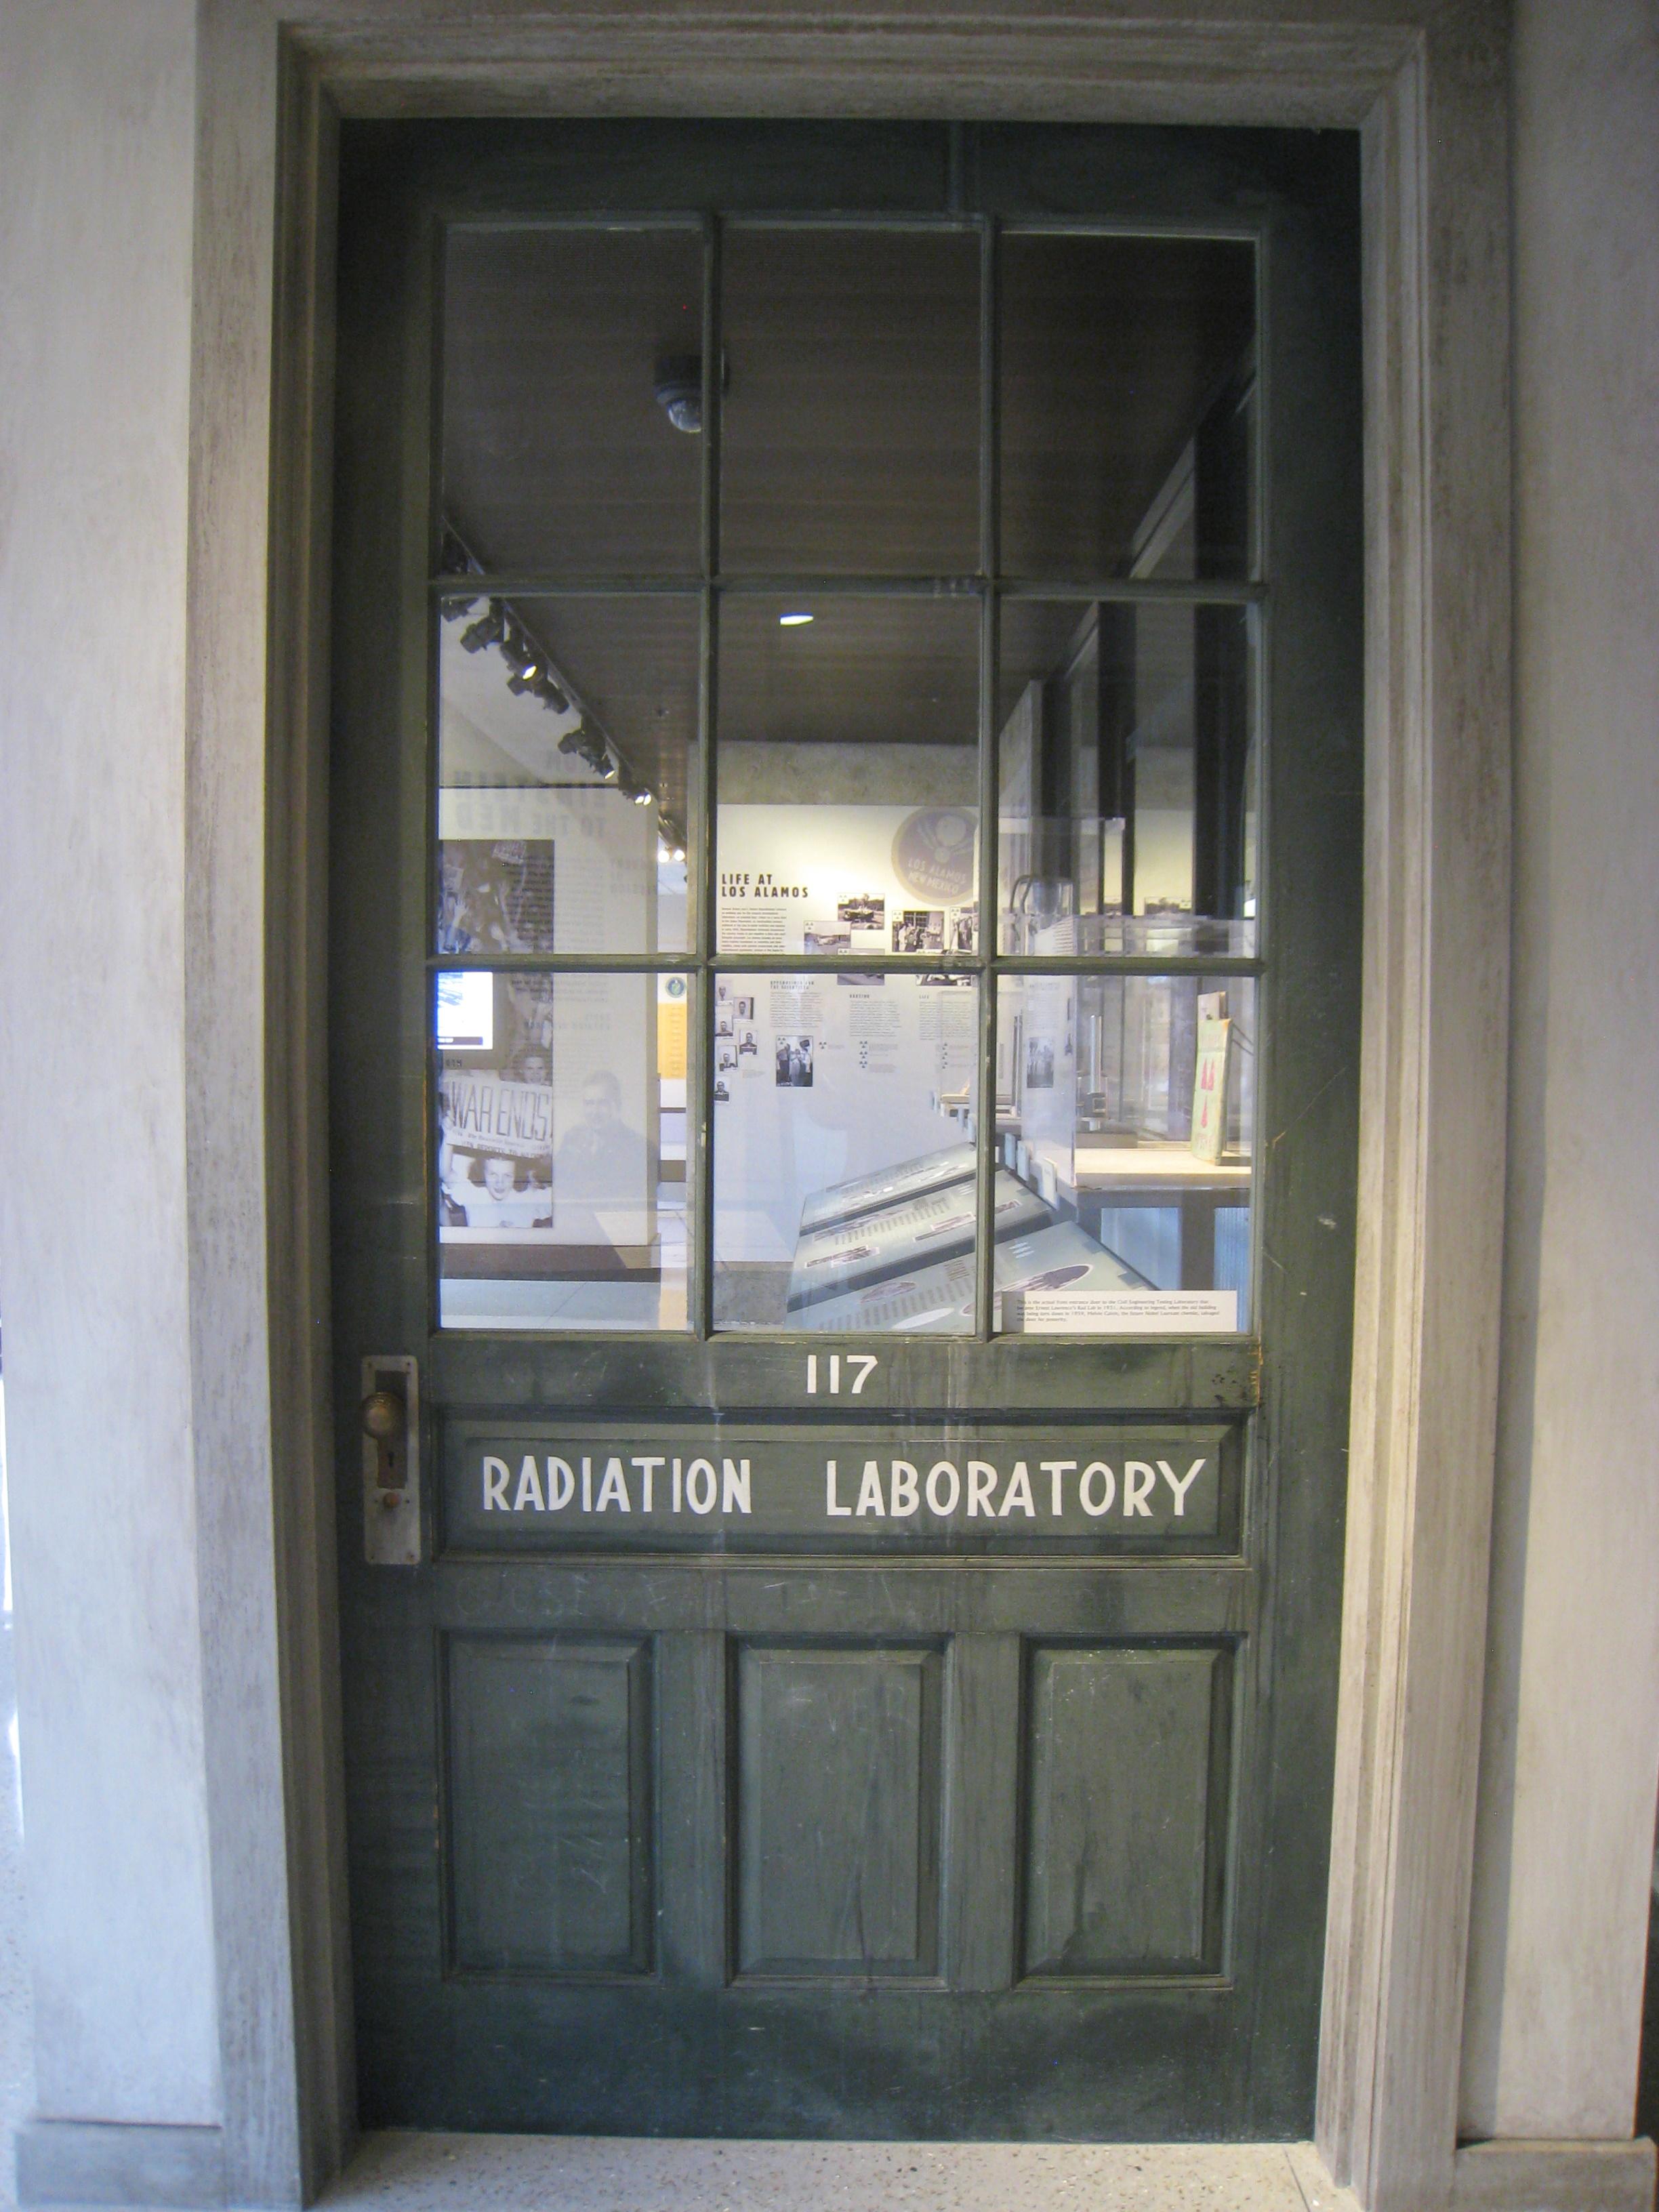 James forristal bilder news infos aus dem web for Door design lab